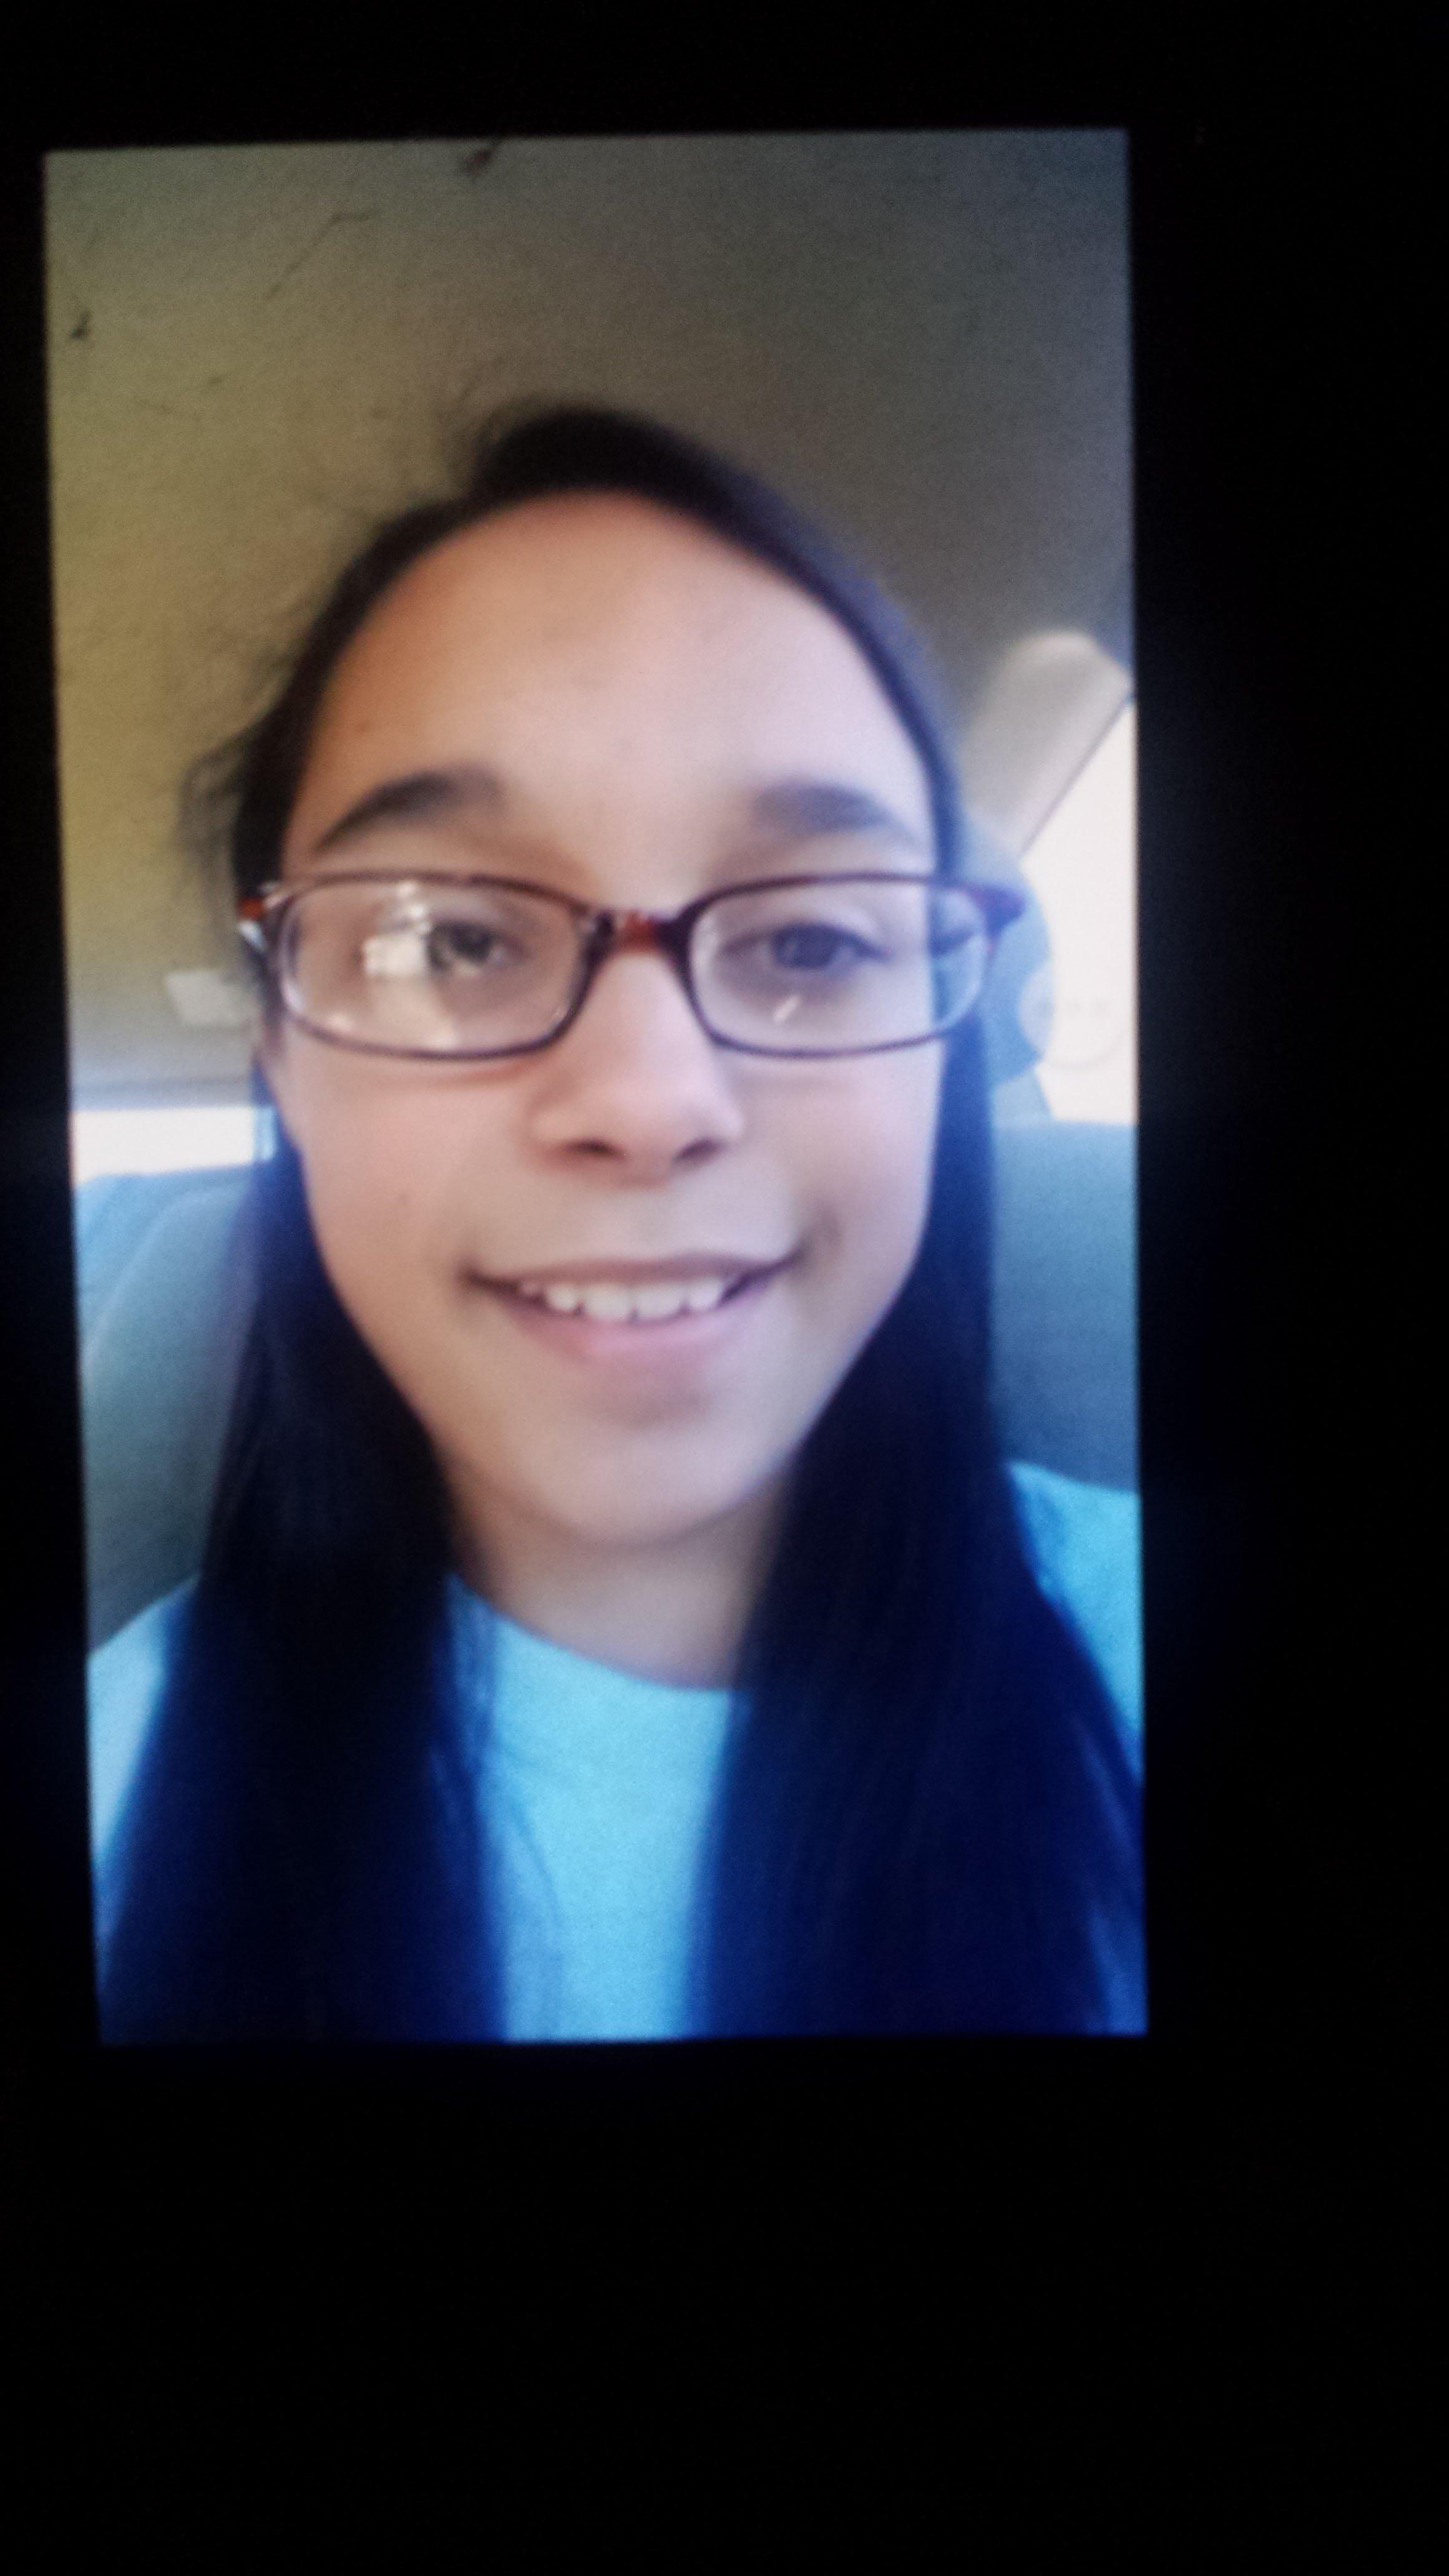 Valerie Cockrill, 12, missing since 7 p.m. Sept. 8 (Source: Phoenix Police Department)